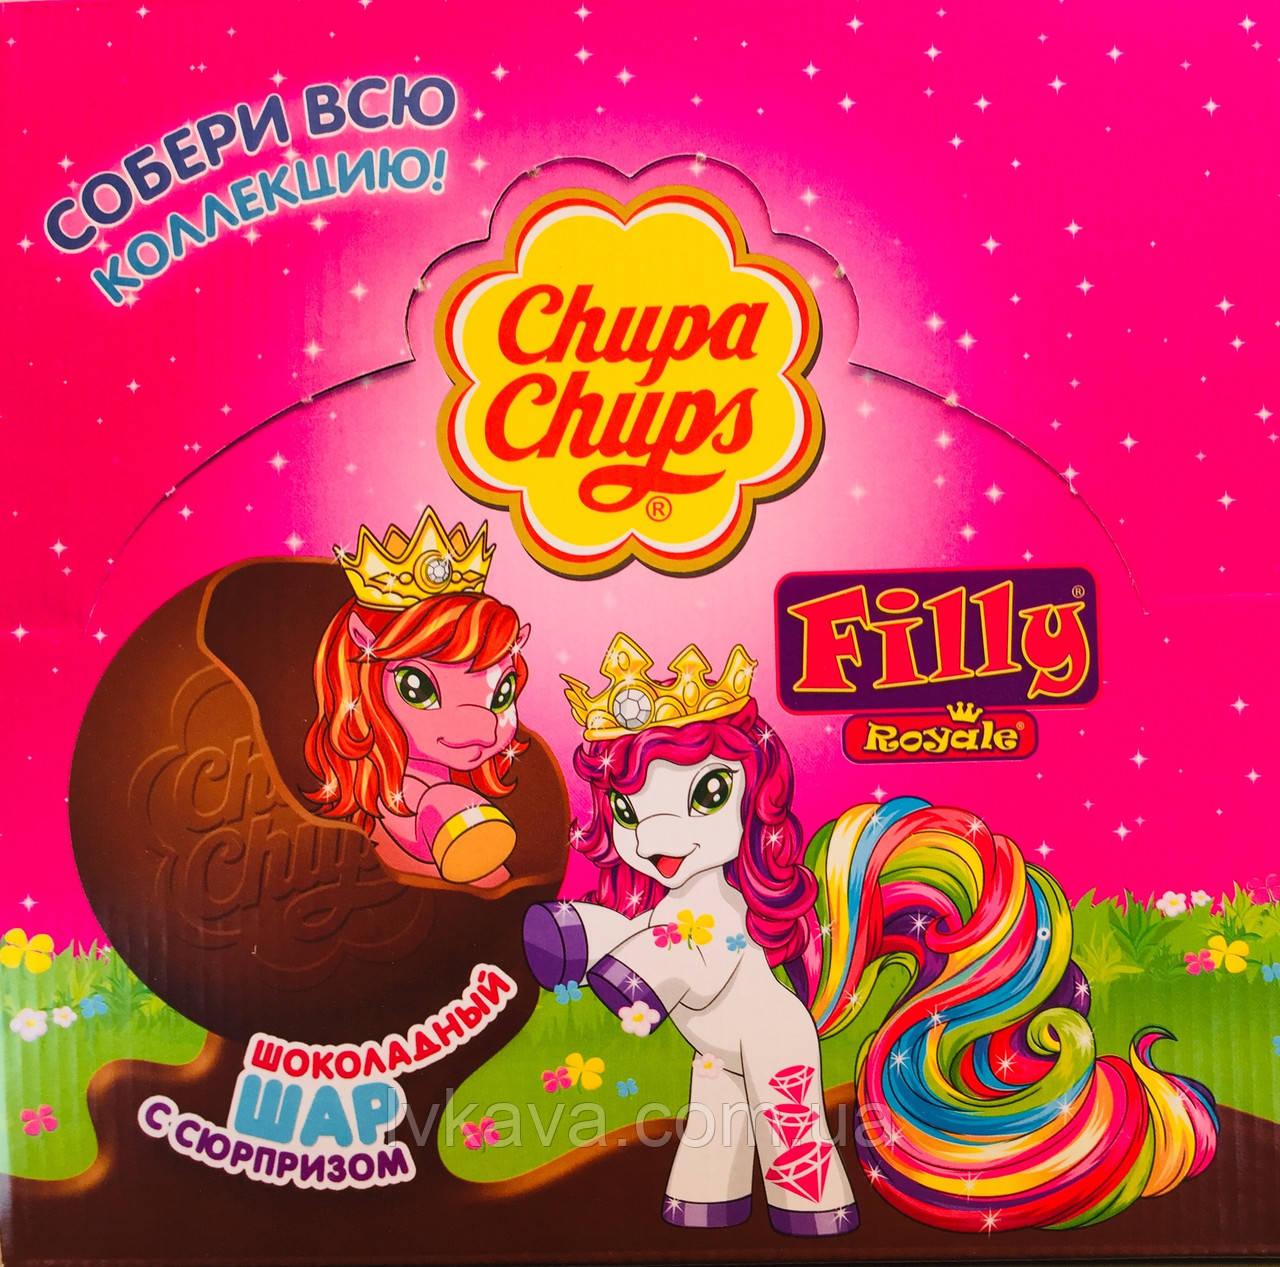 Шоколадный шар Filly Royle  Chupa Chups с сюрпризом , 20 g X 18 шт